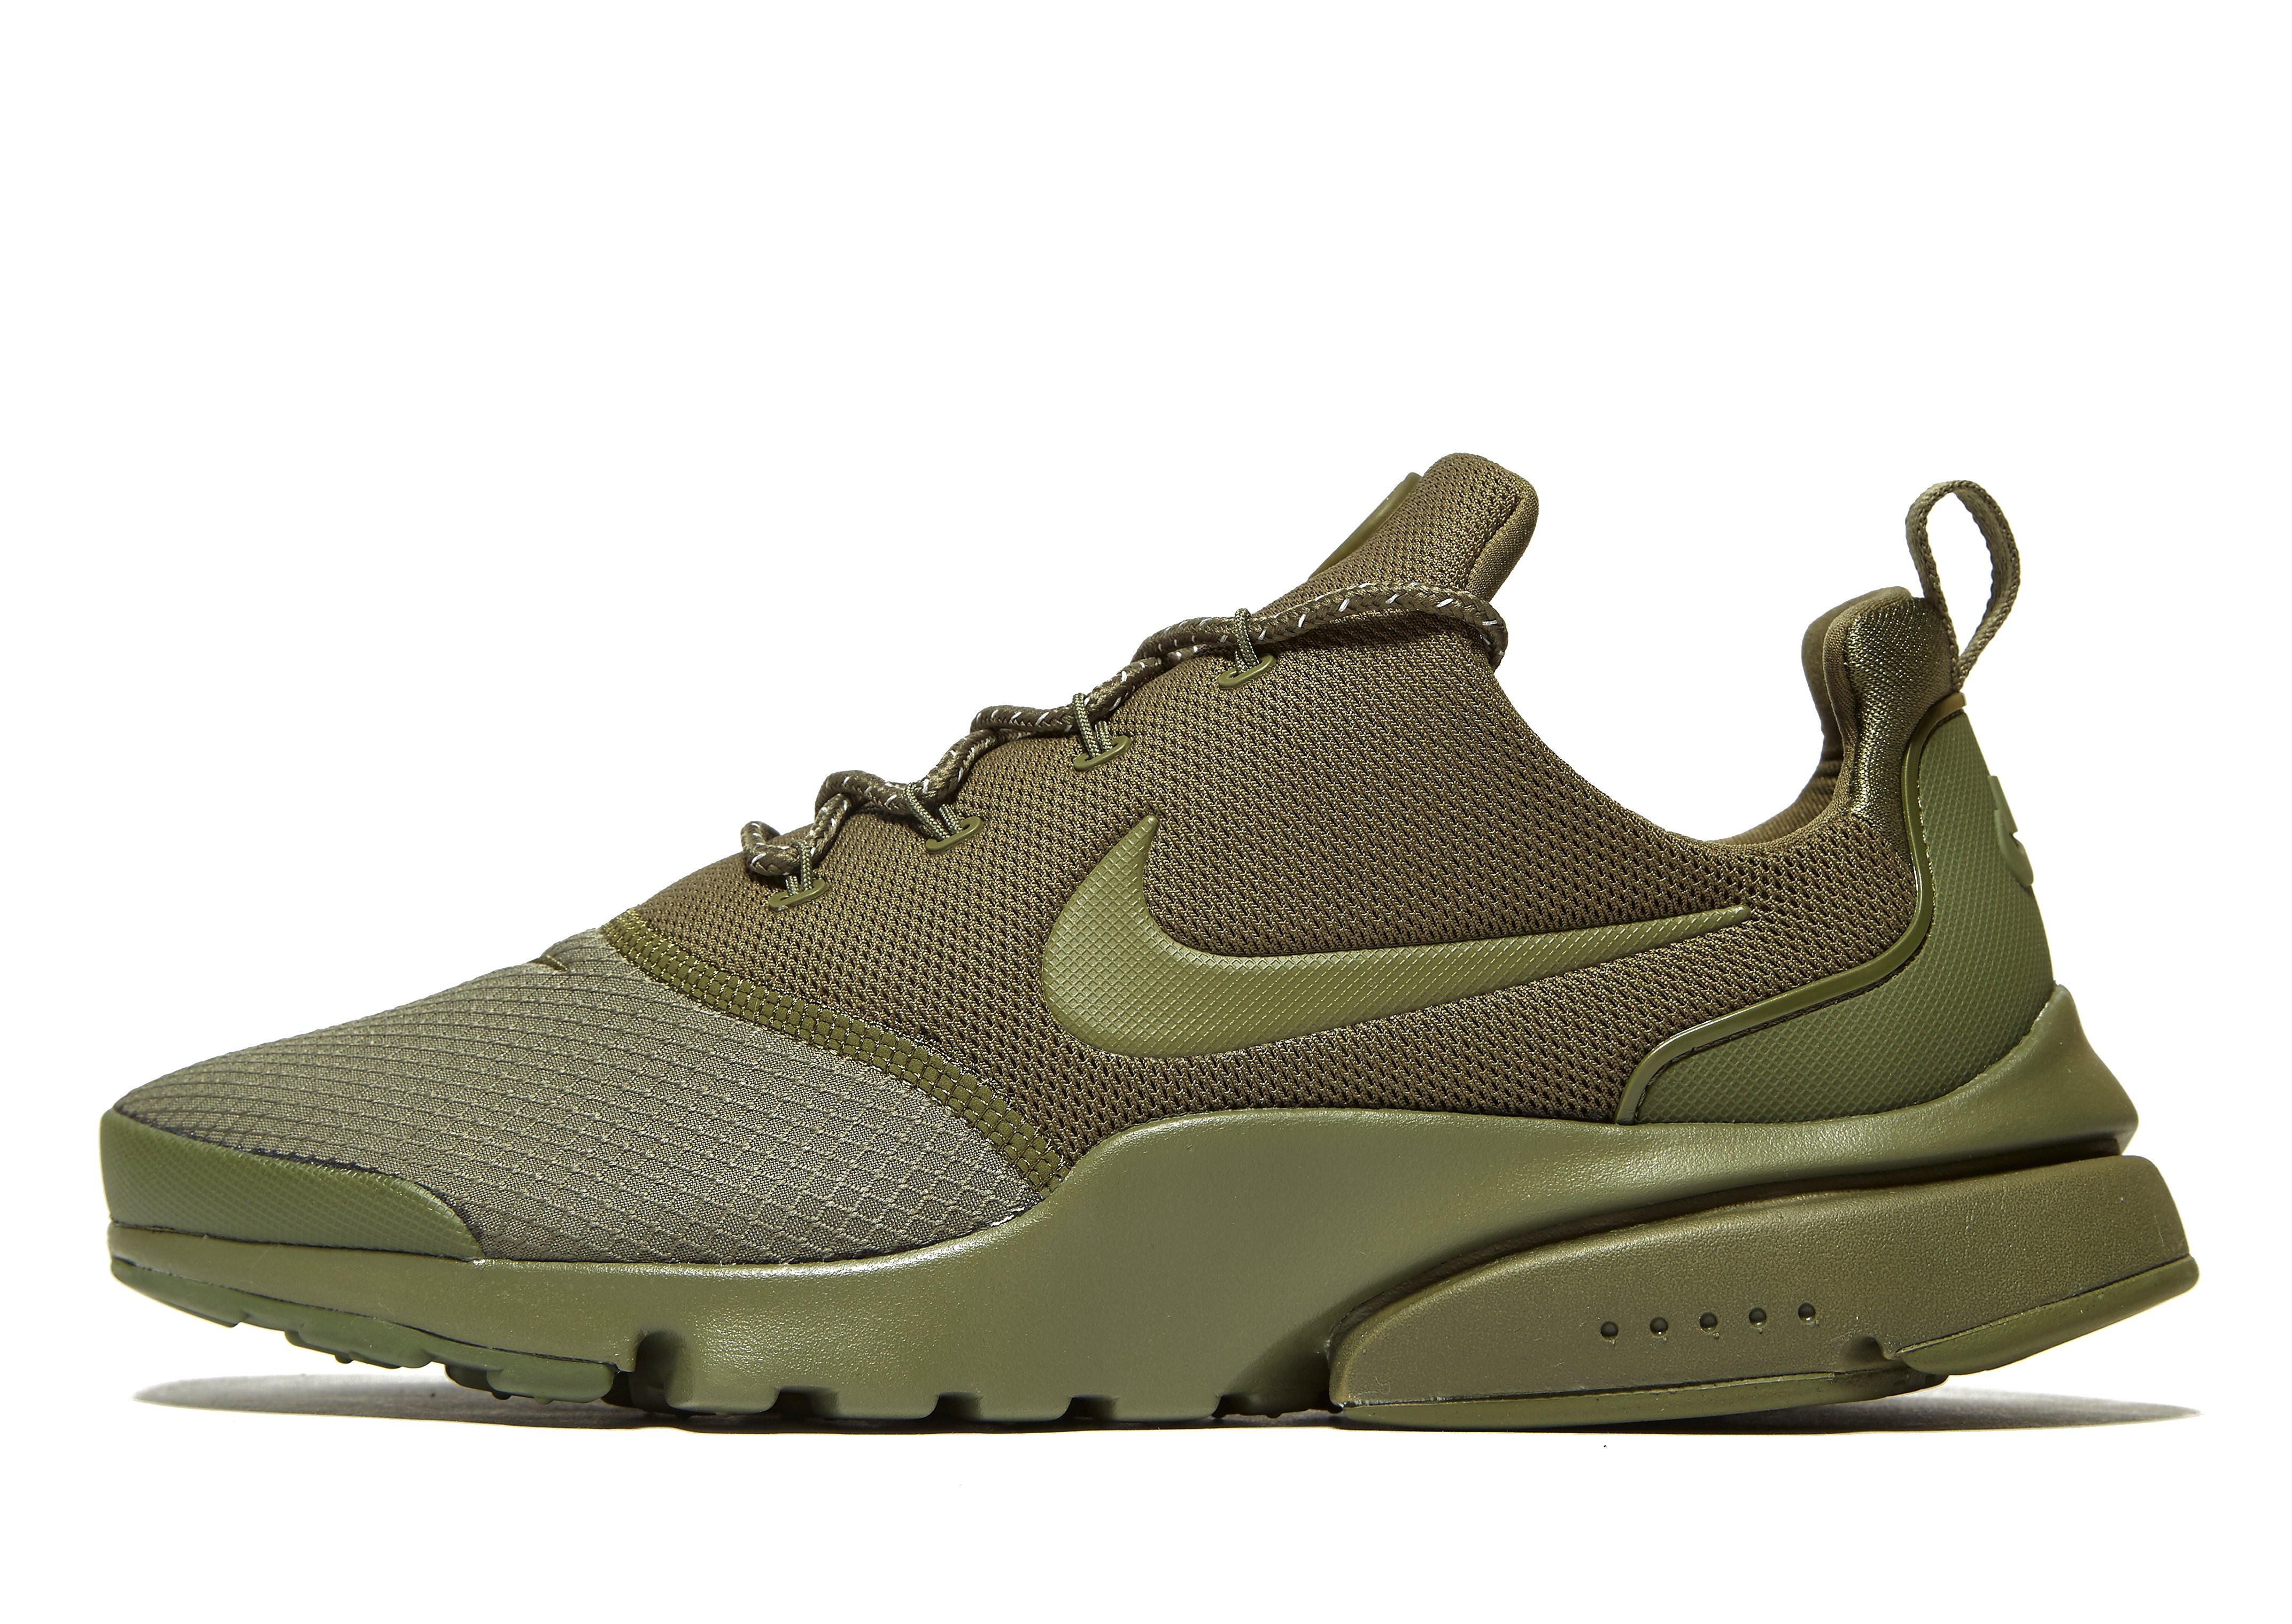 Nike Air Presto Fly SE Olivegrün